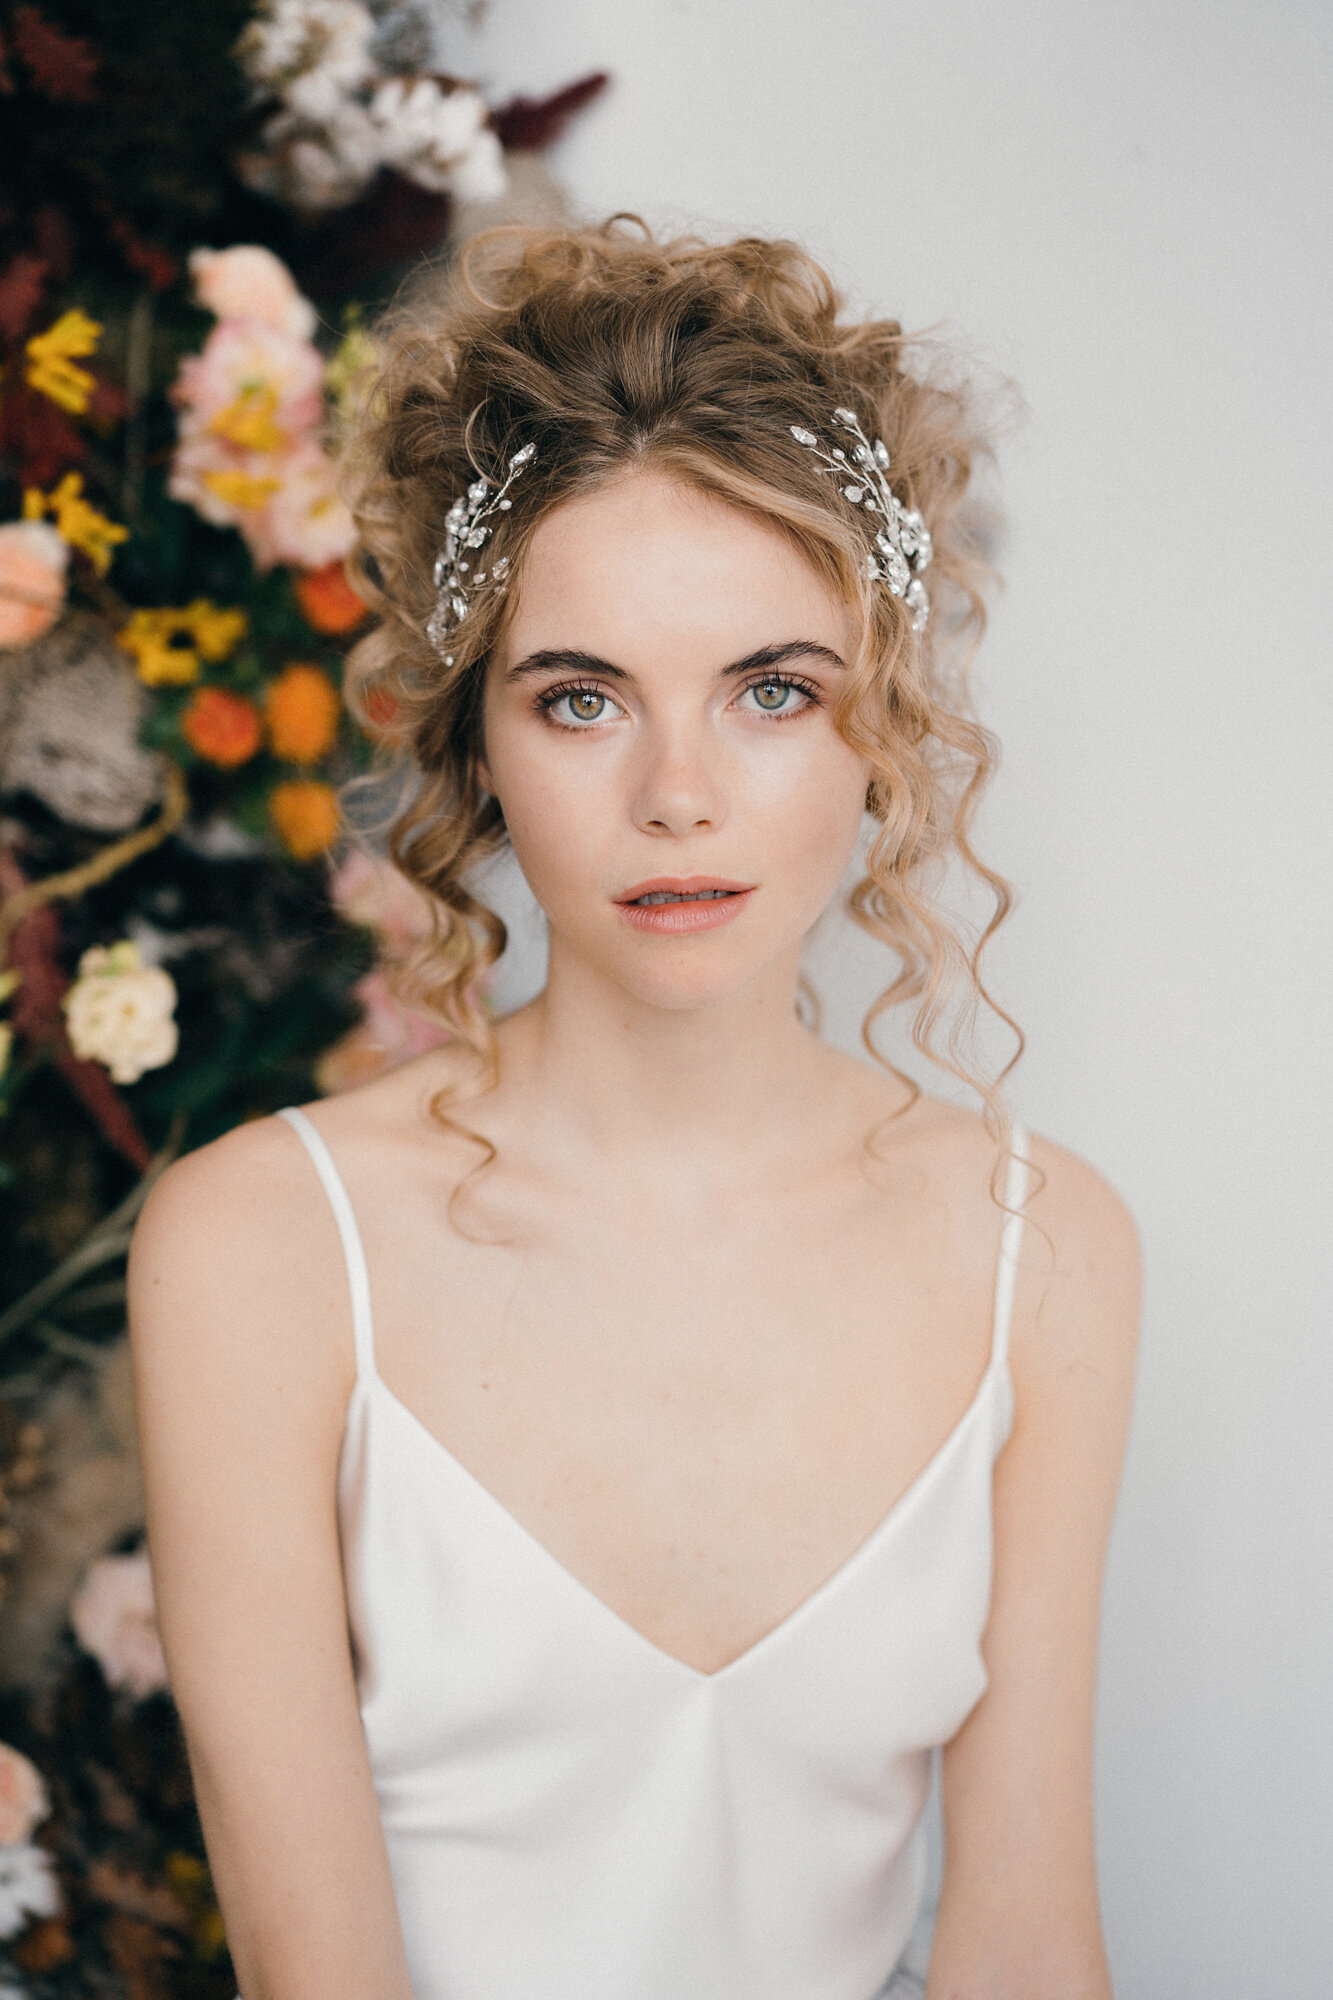 Debbie-Carlisle-Bridal-Accessories-Kate-Beaumont-Wedding-Gowns-Sheffield-Yorkshire-UK-26.jpg